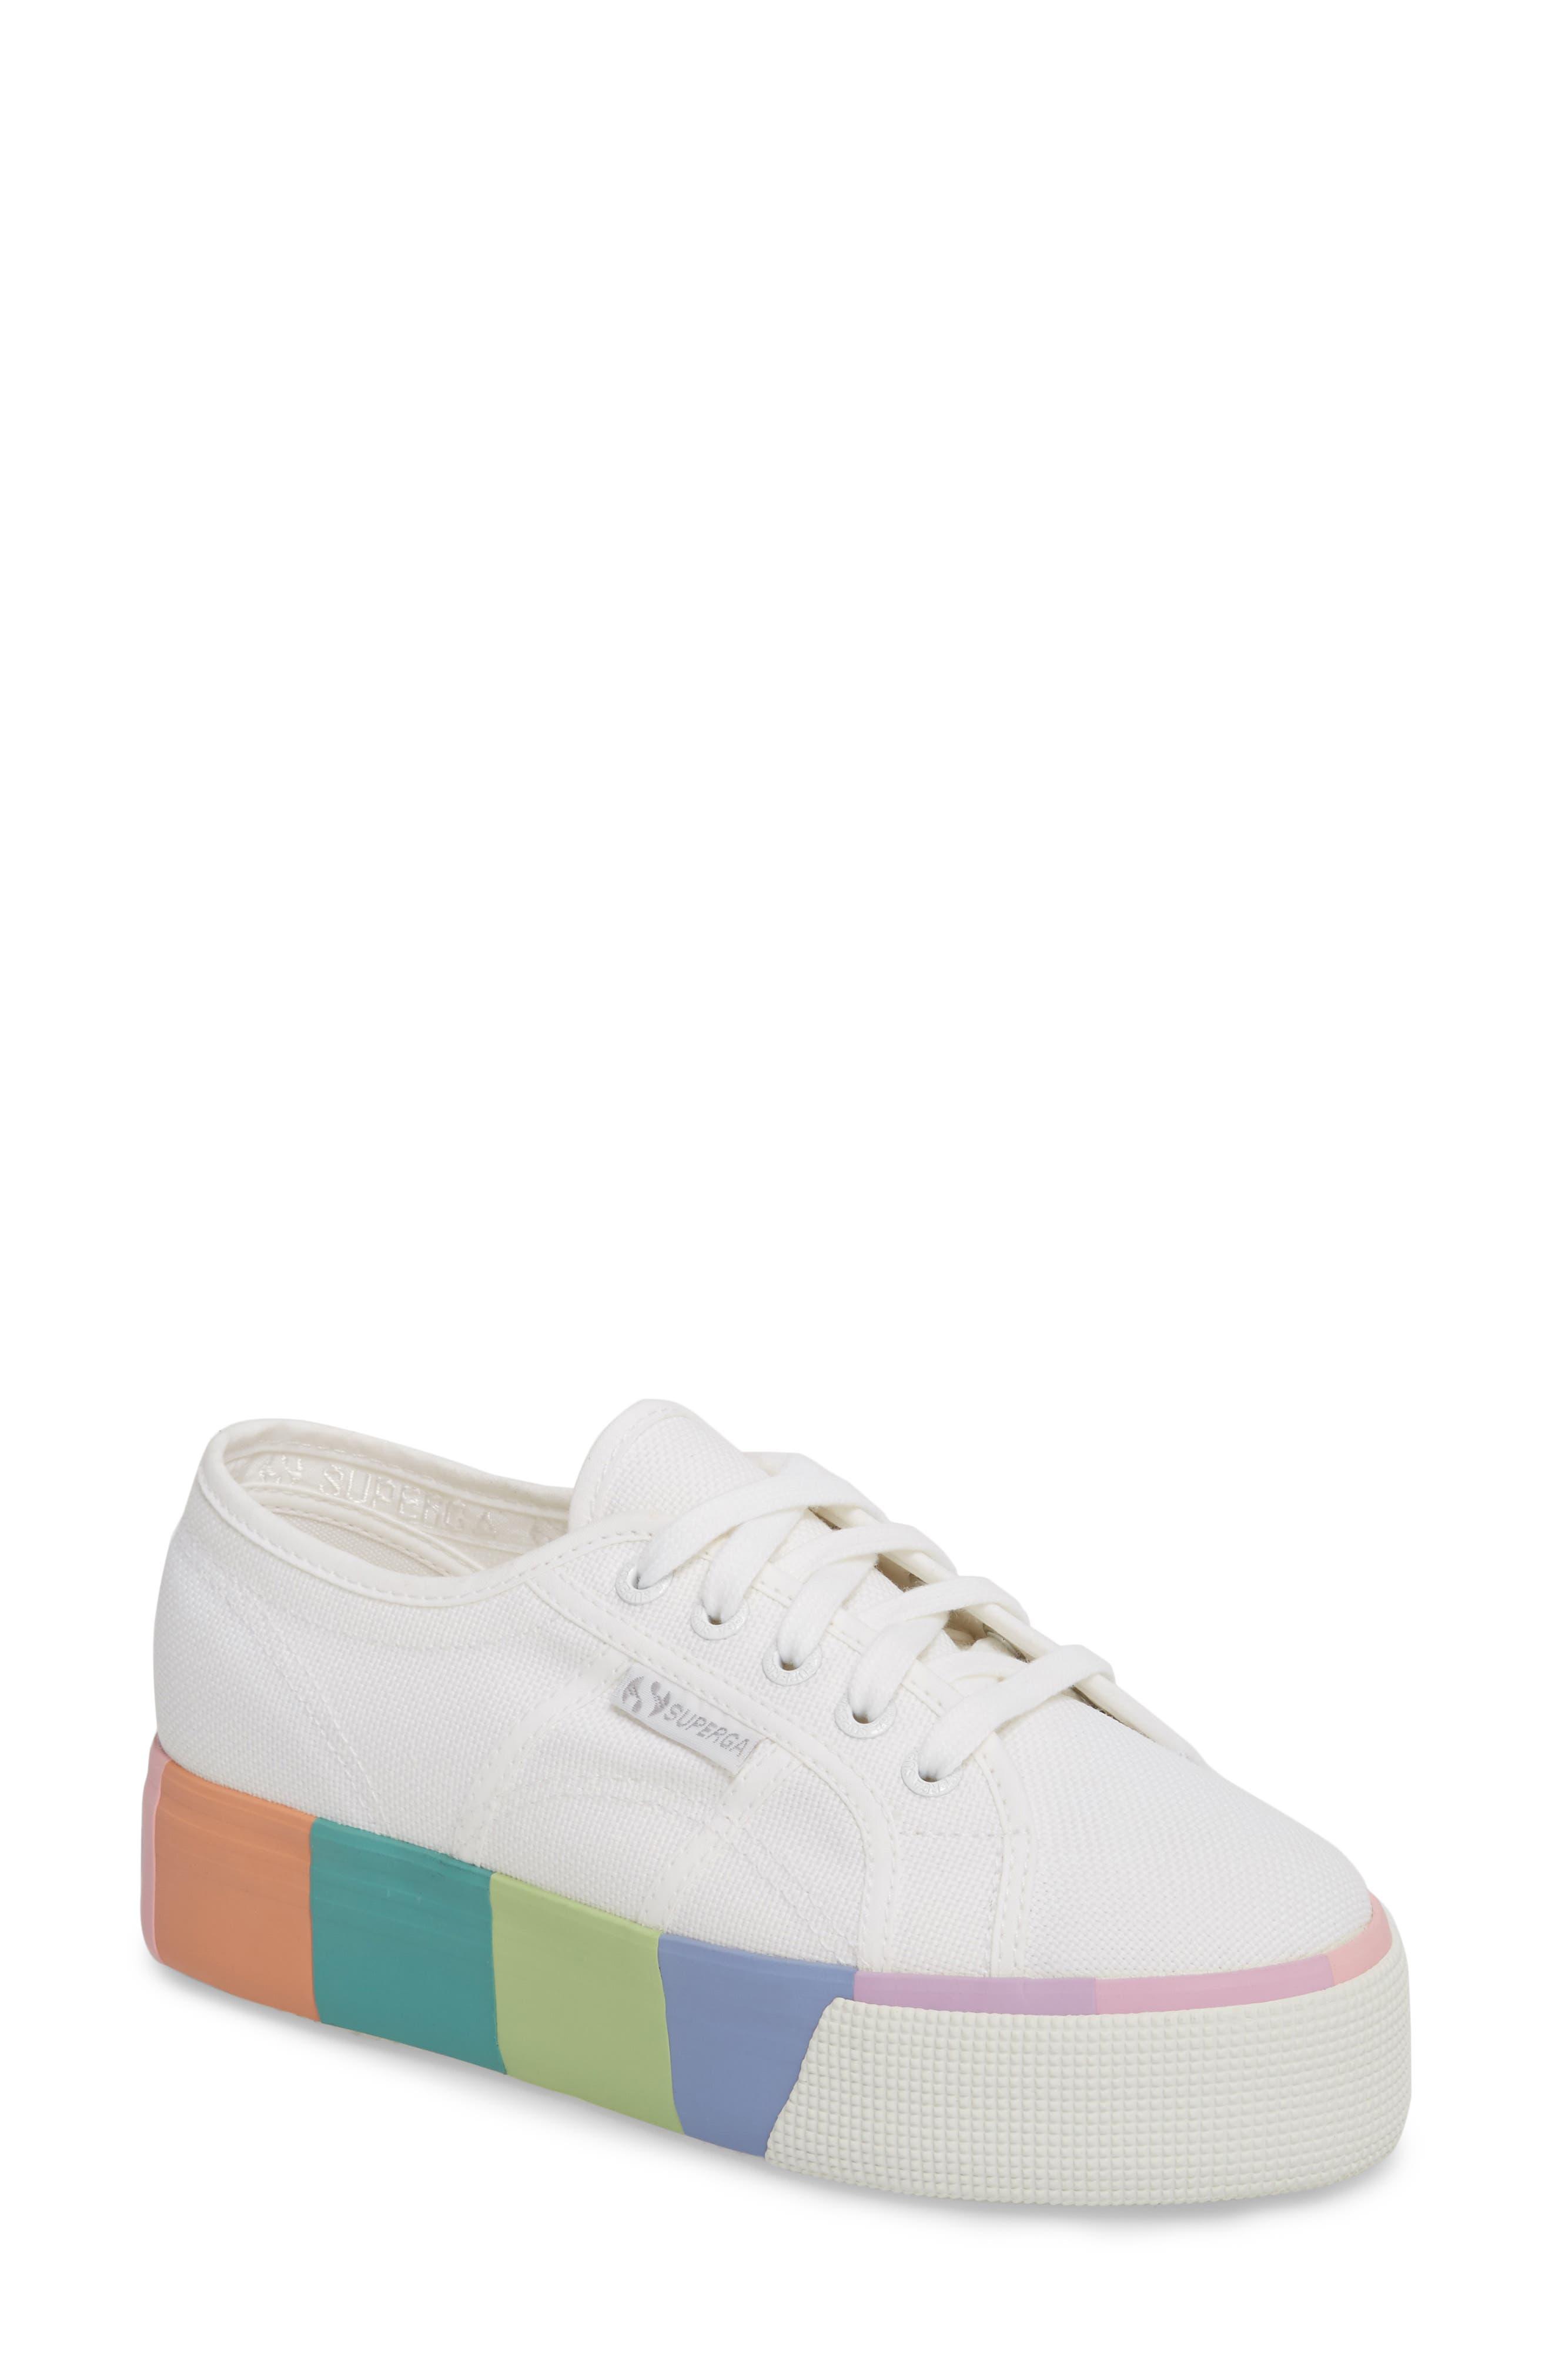 2790 Platform Sneaker,                         Main,                         color, 100